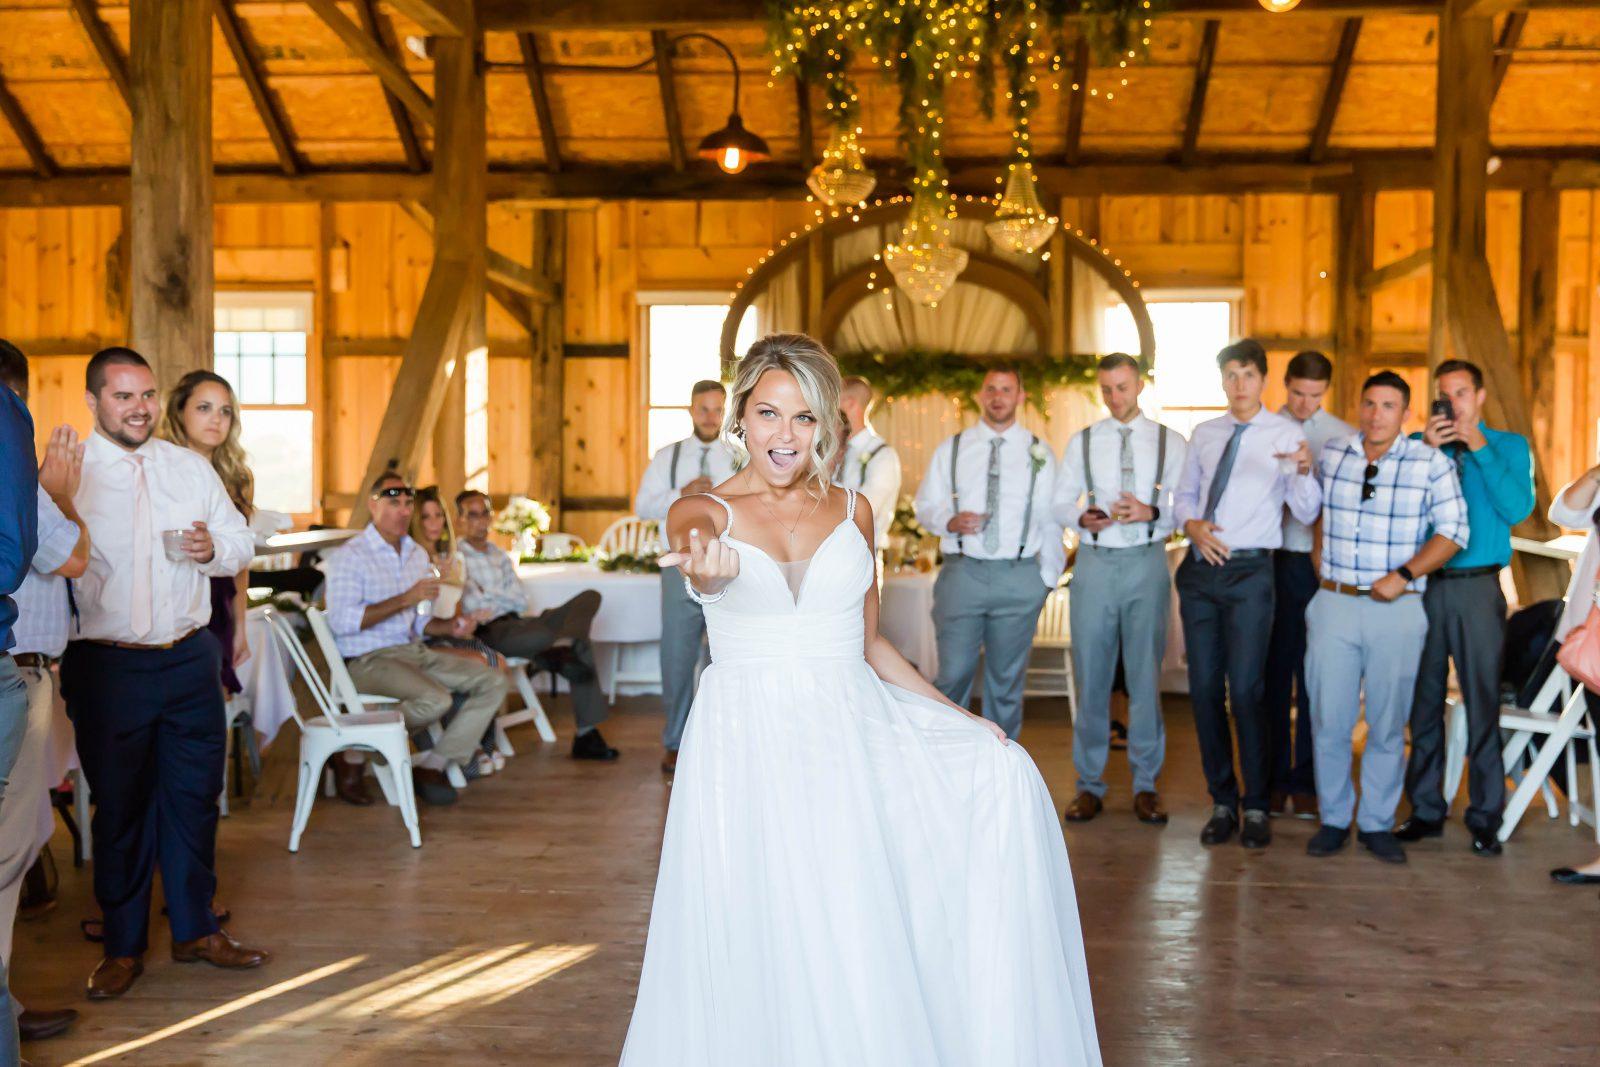 peacock-ridge-summer-wedding-photographer-akron-ohio-loren-jackson-photography-92